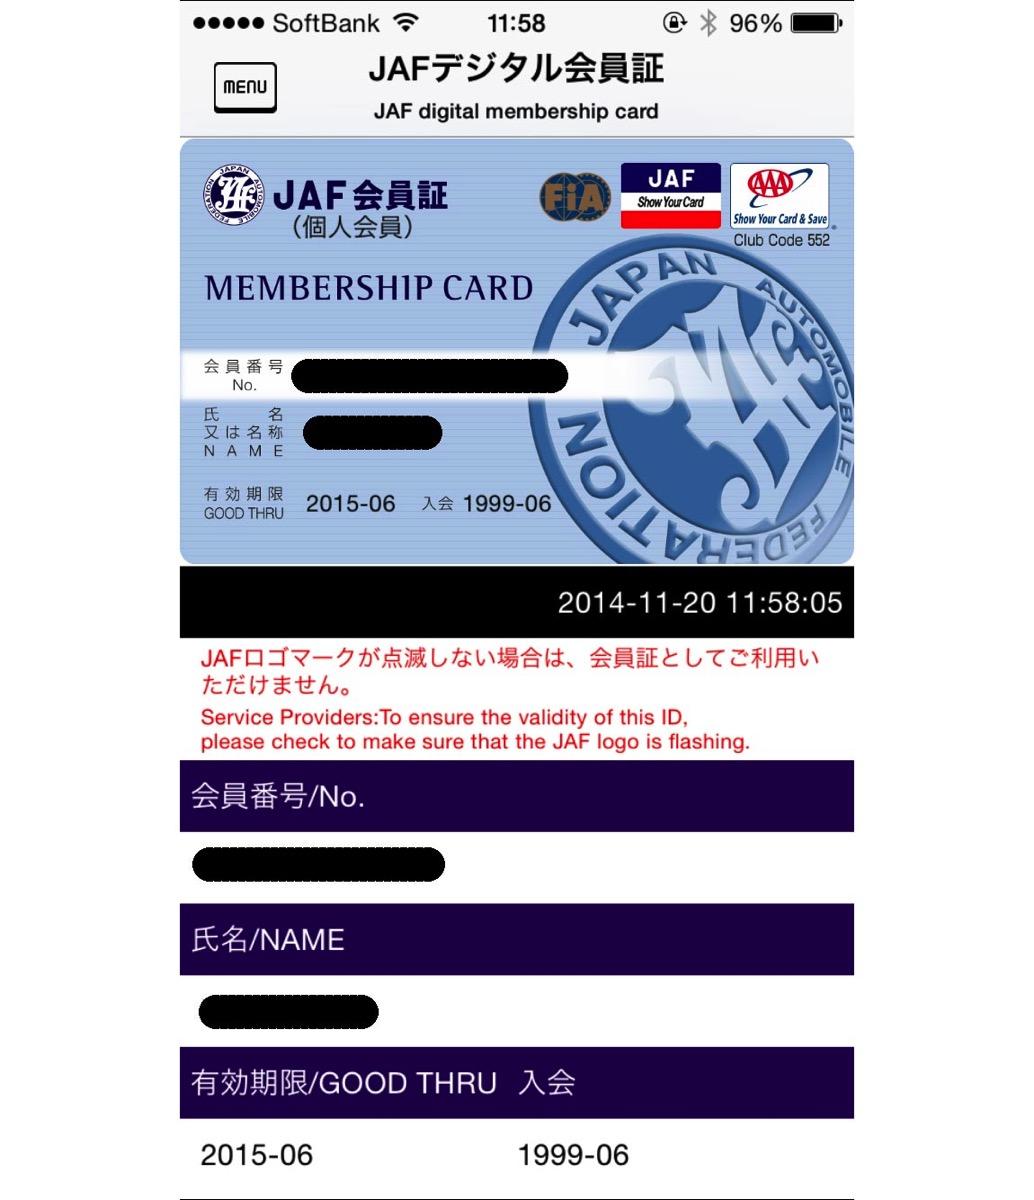 JAFデジタル会員証 iPhone